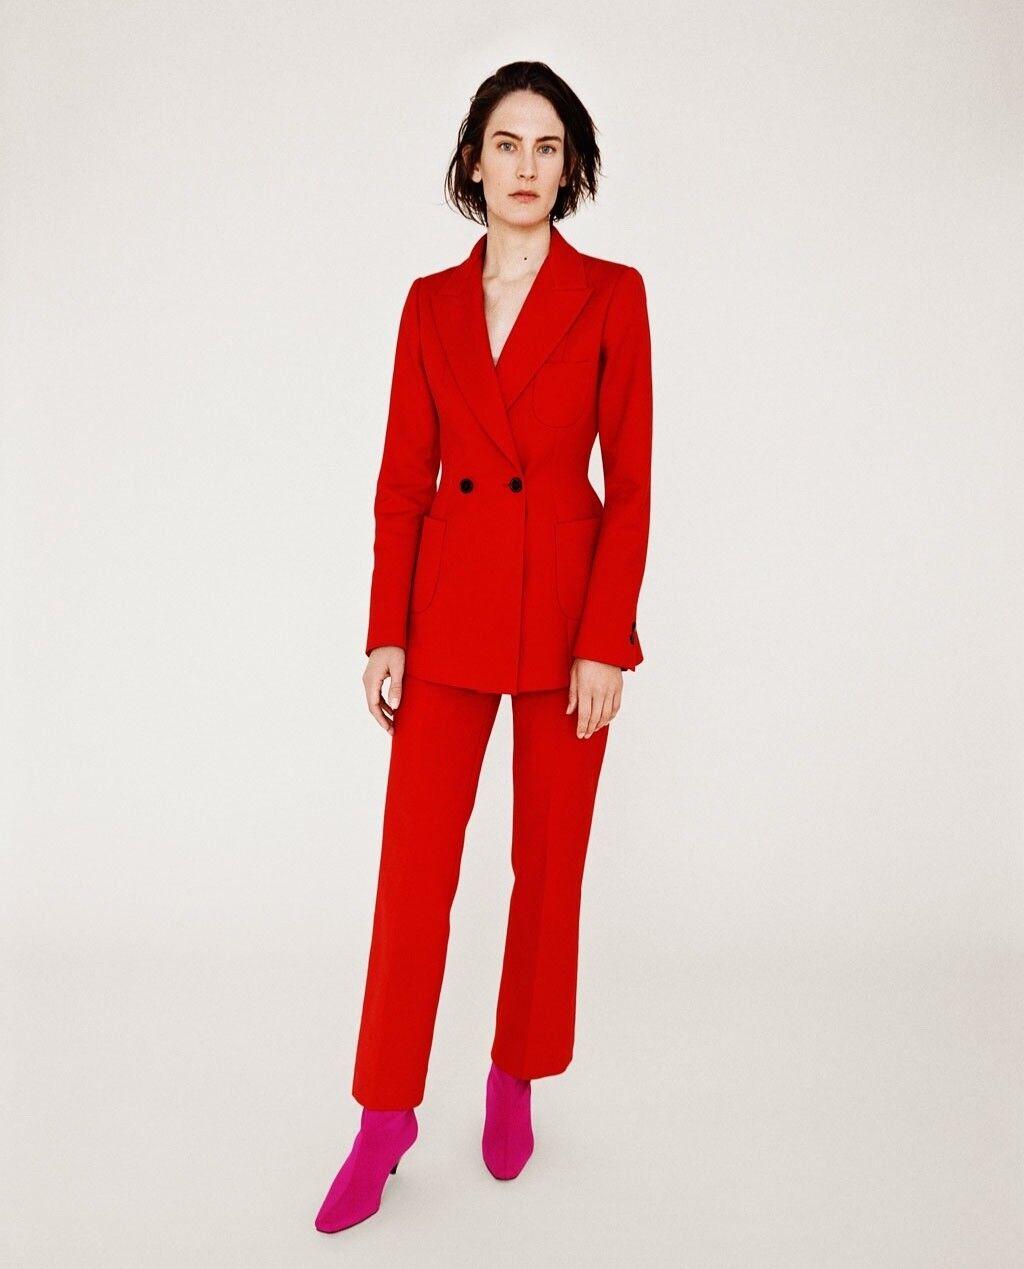 Brand New Red Zara Suit in XS (blazer + pants)